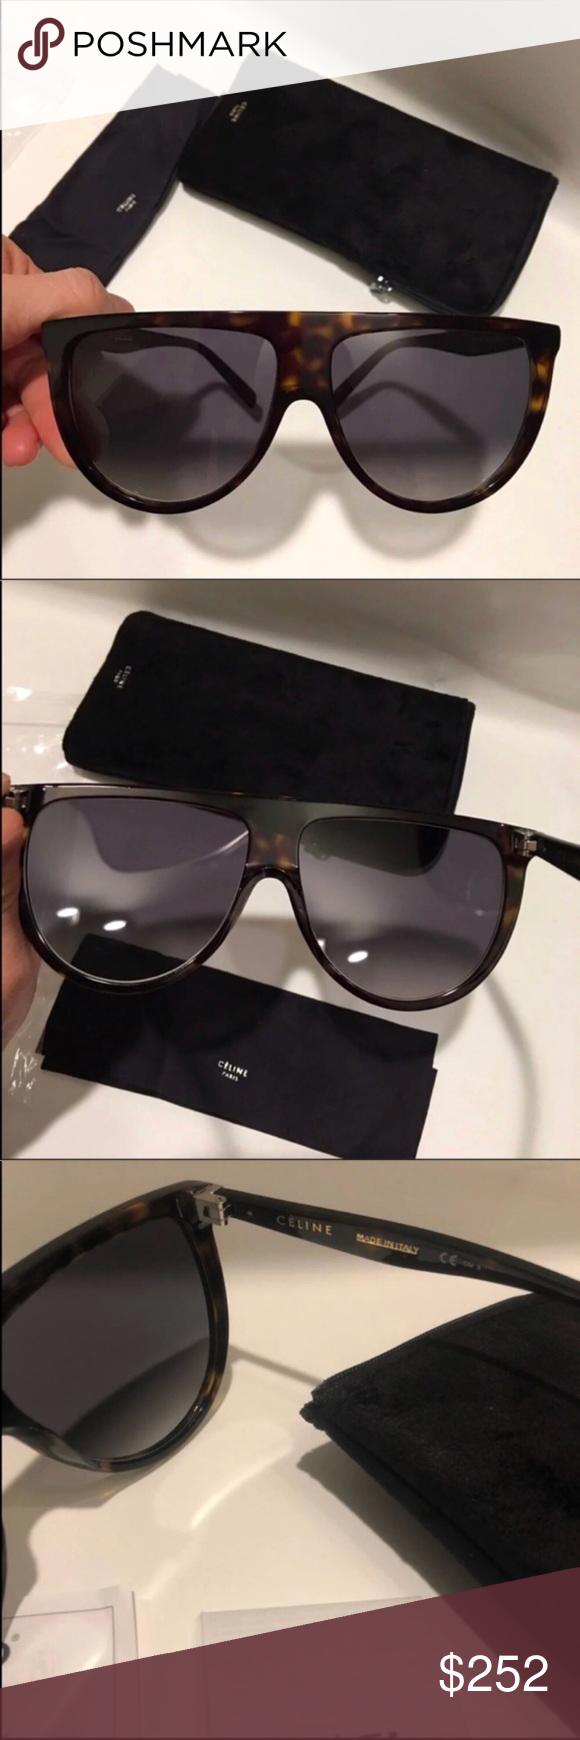 49e01eae1bcf Celine Thin Shadow sunglasses 🔥 Celine 41435 s Thin shadow dark havana  sunglasses 100% new and authentic. Includes original Celine case and Celine  cloth.